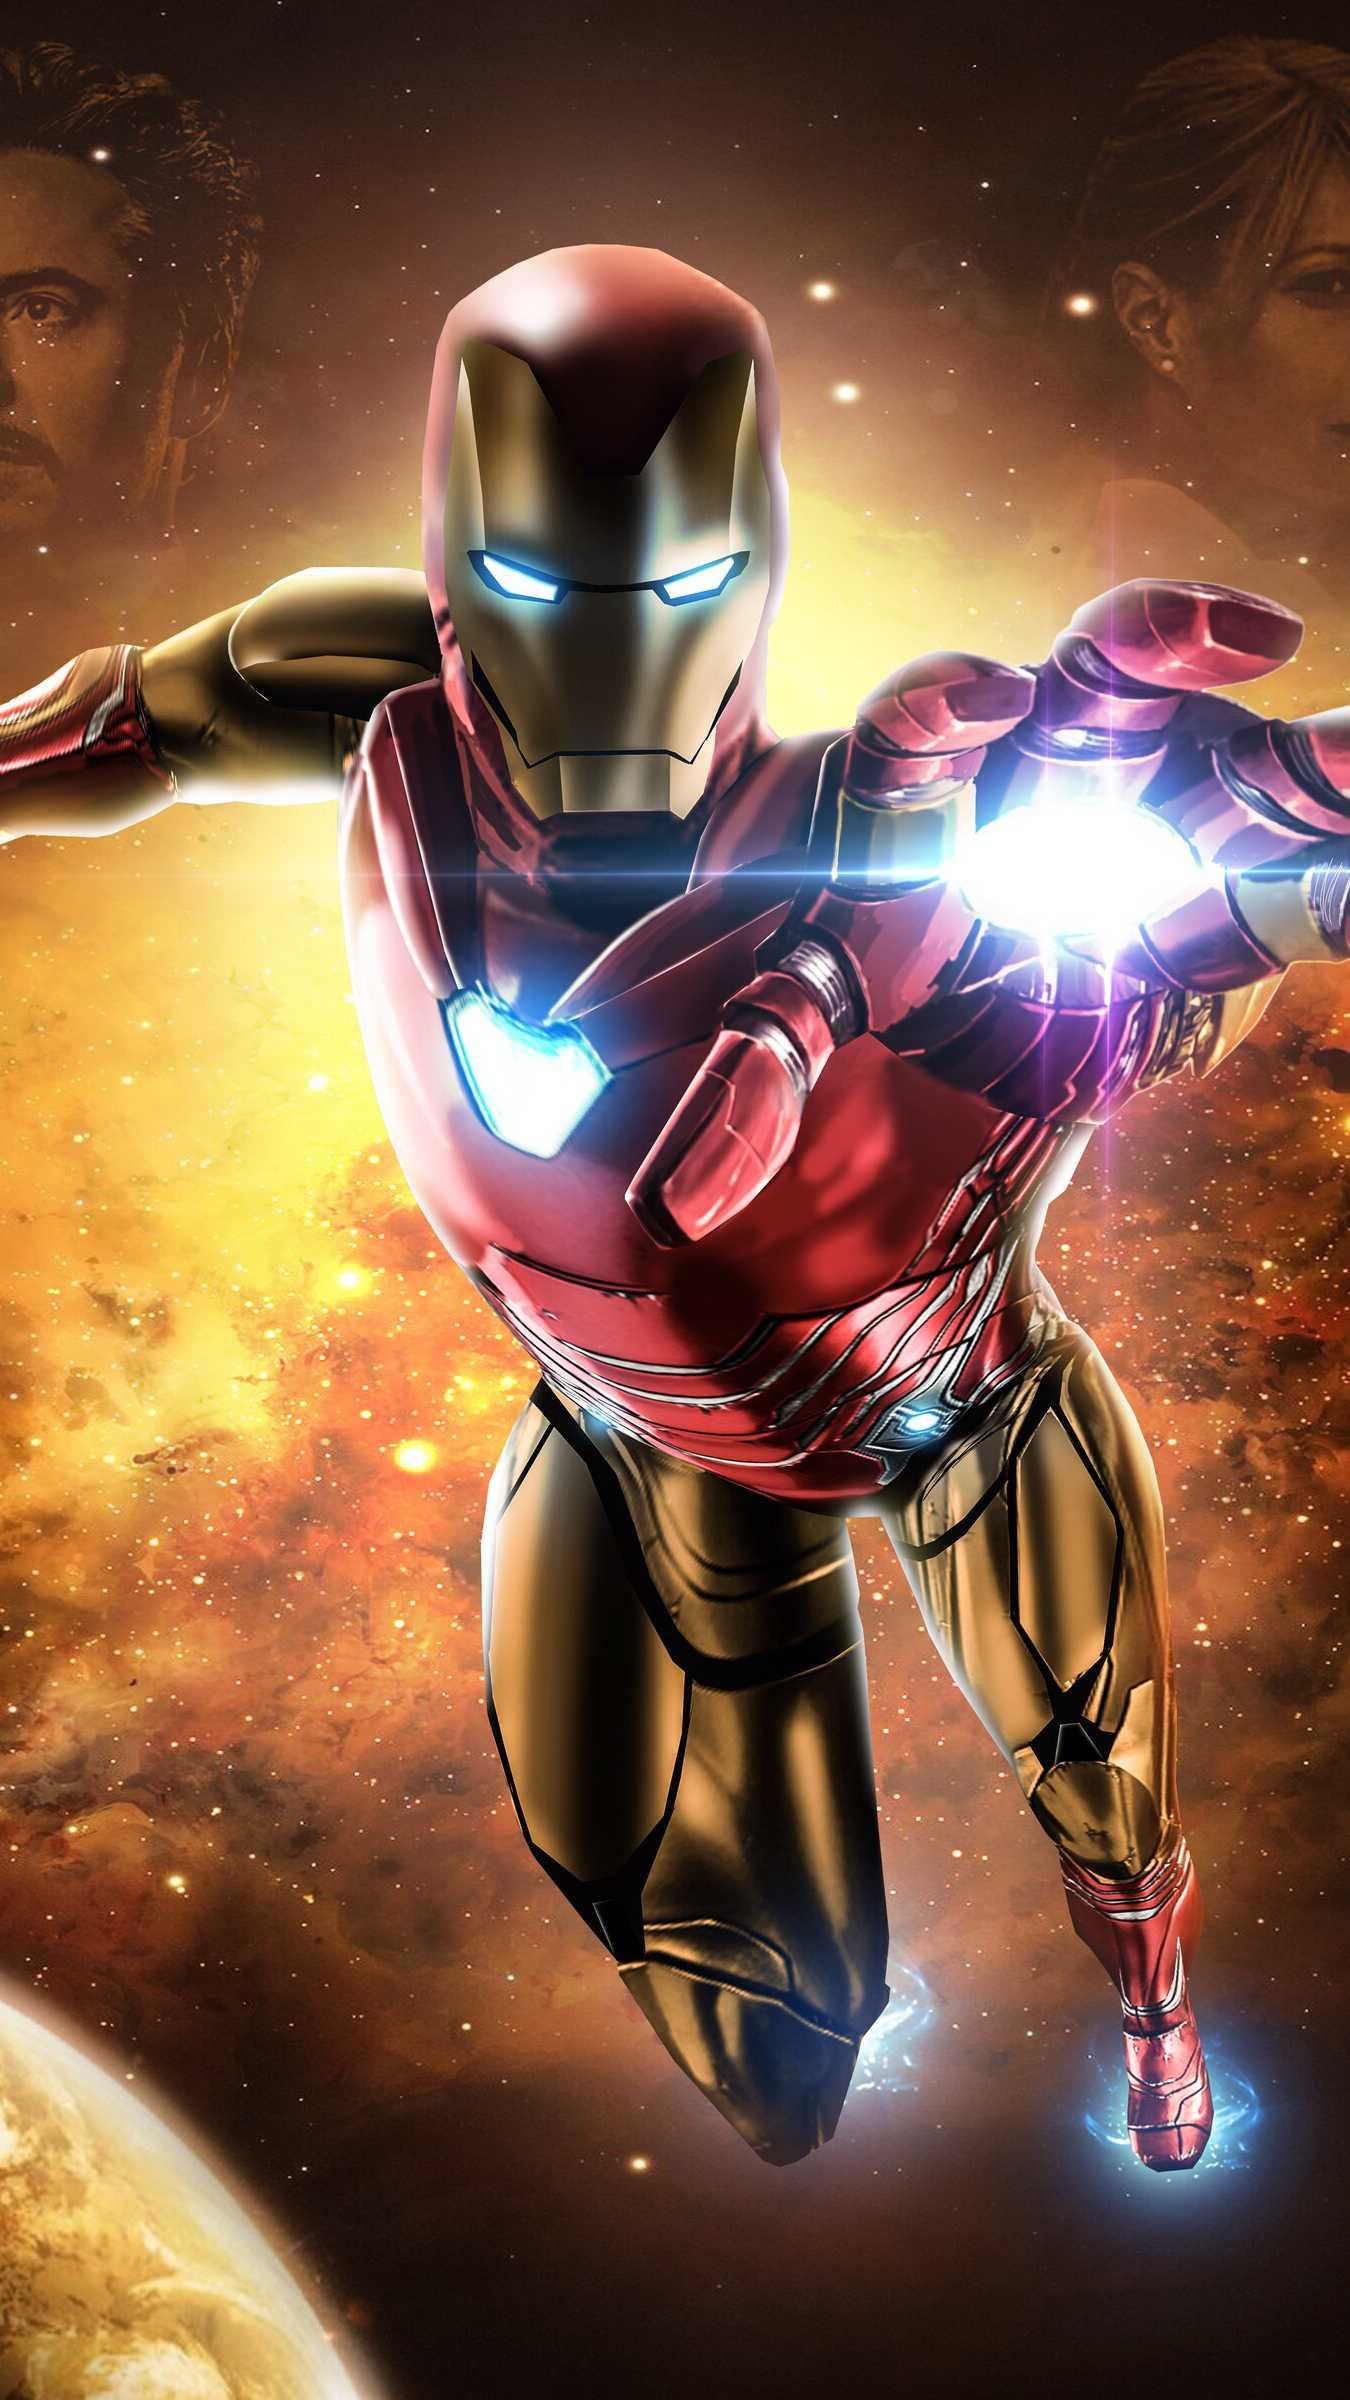 Avengers Endgame Iron Man Mark 85 Armor Space iPhone Wallpaper